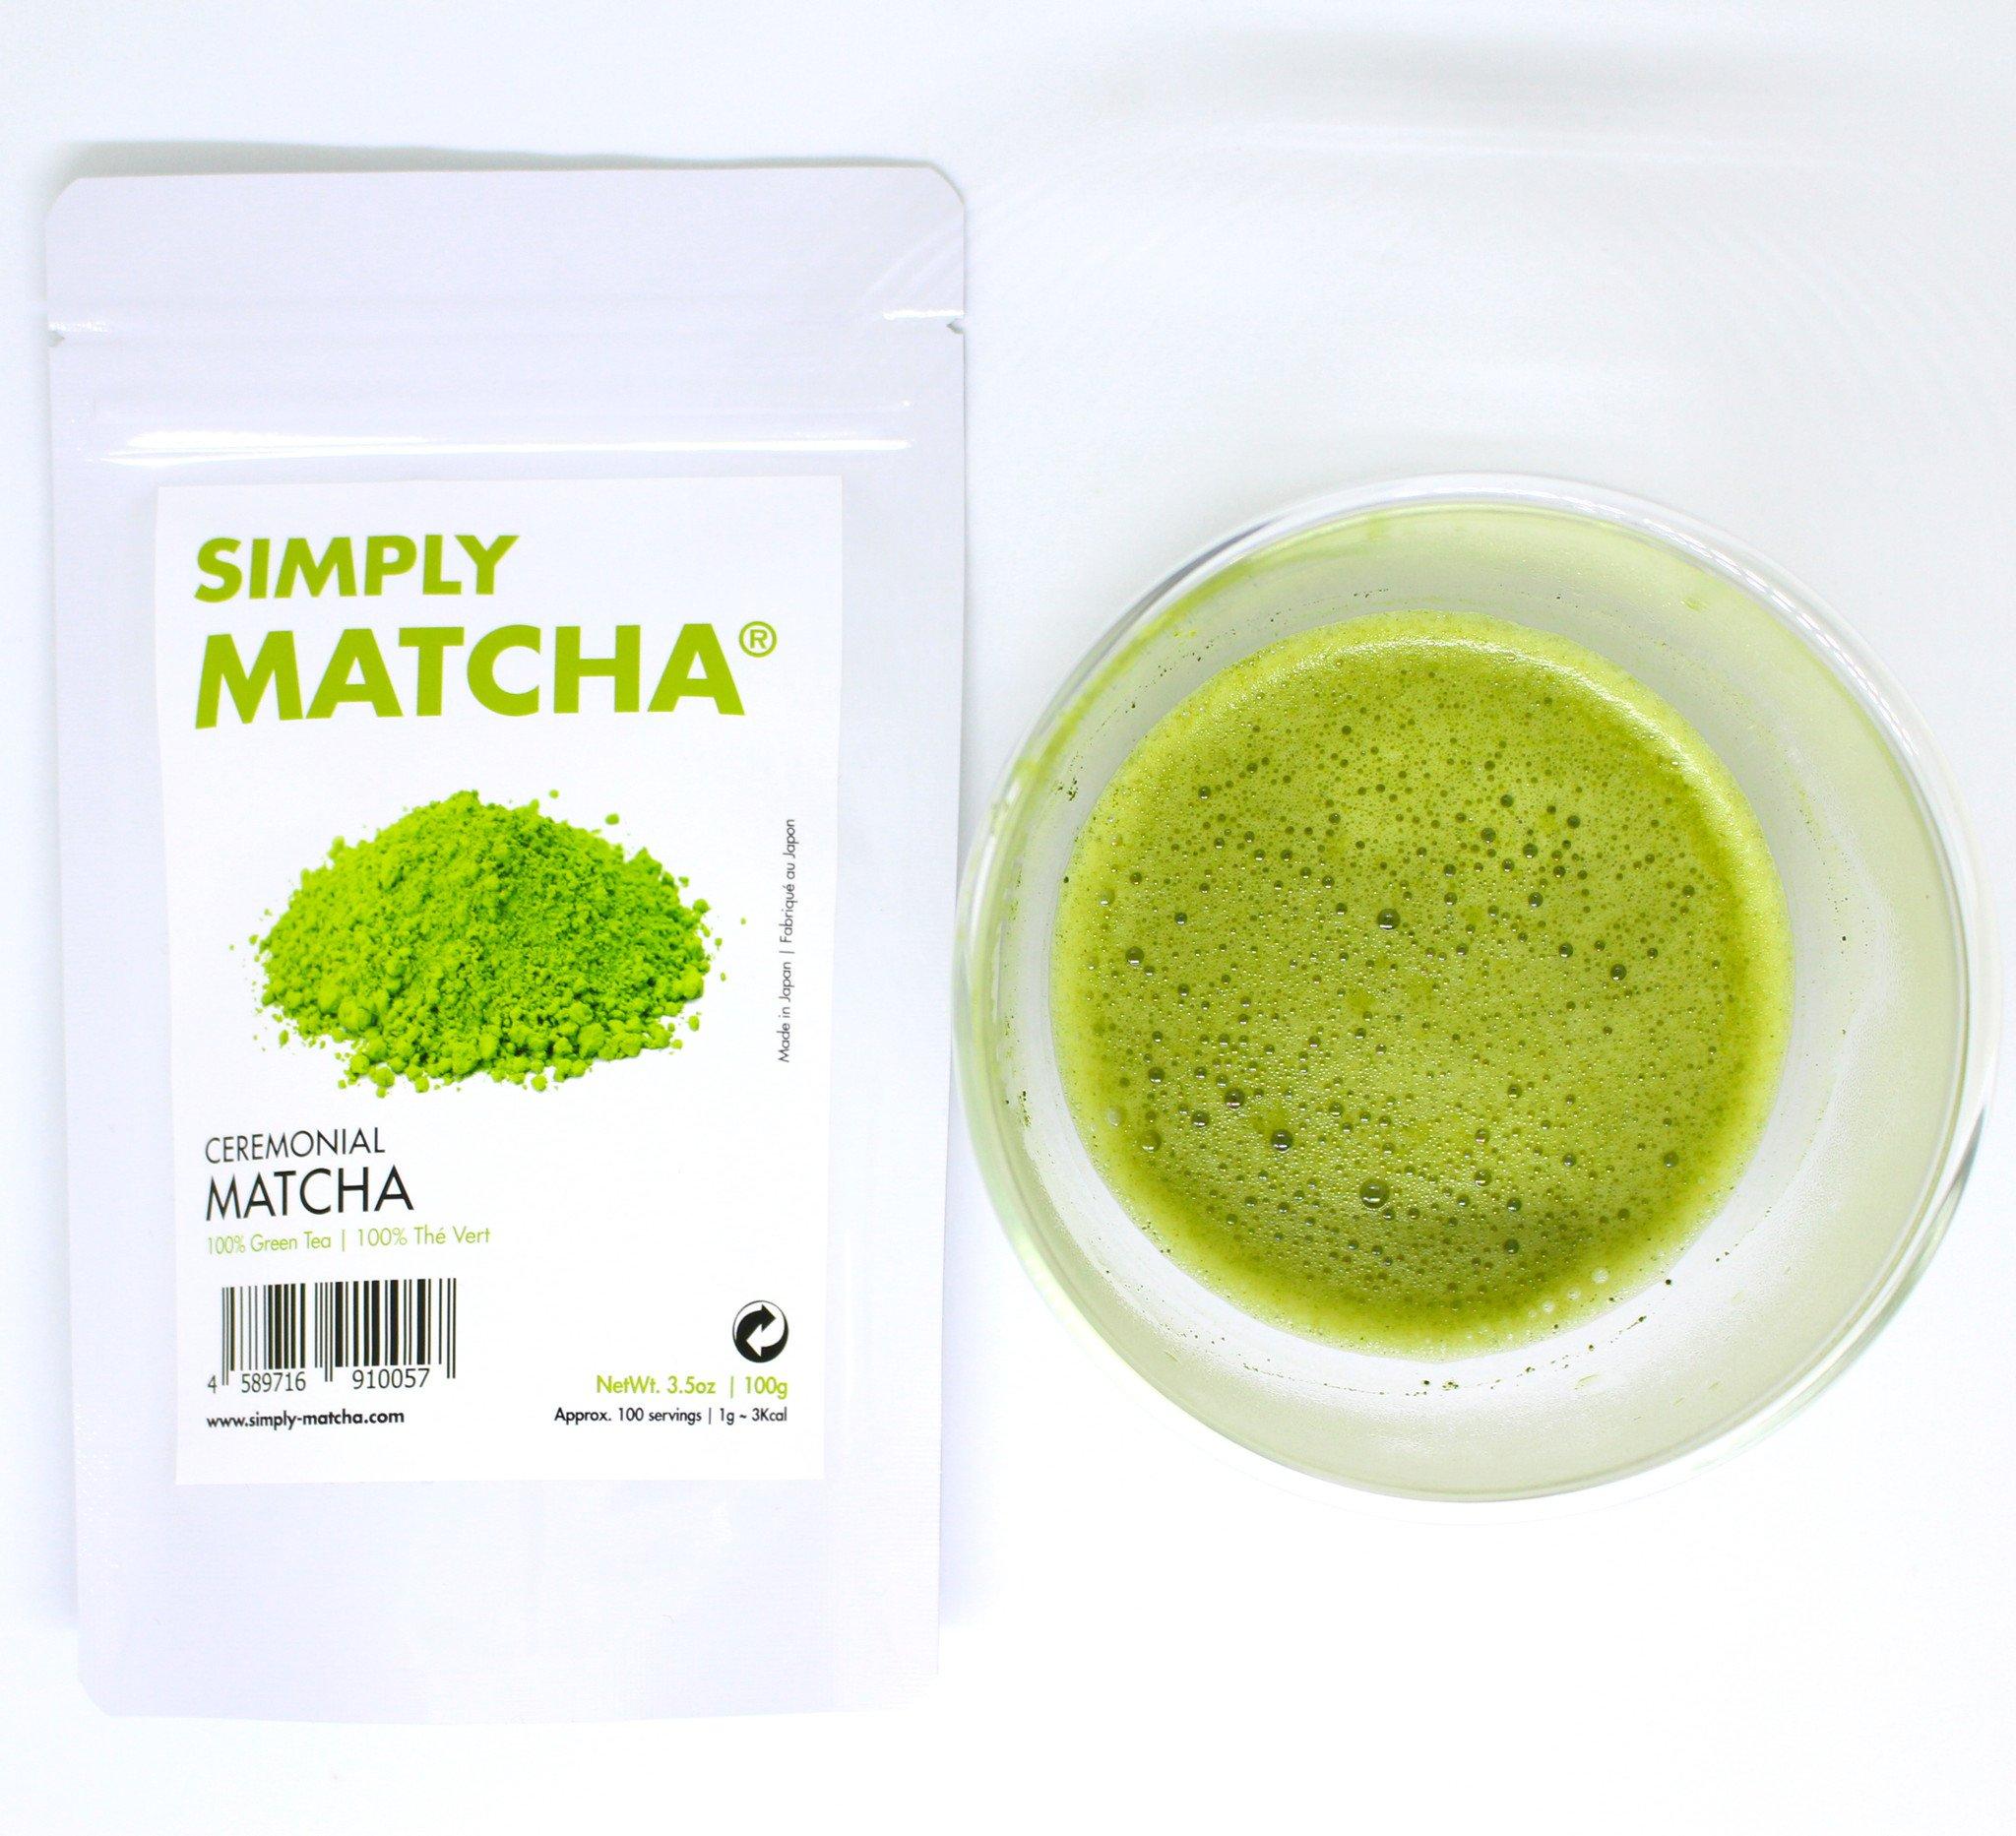 the matcha qualite